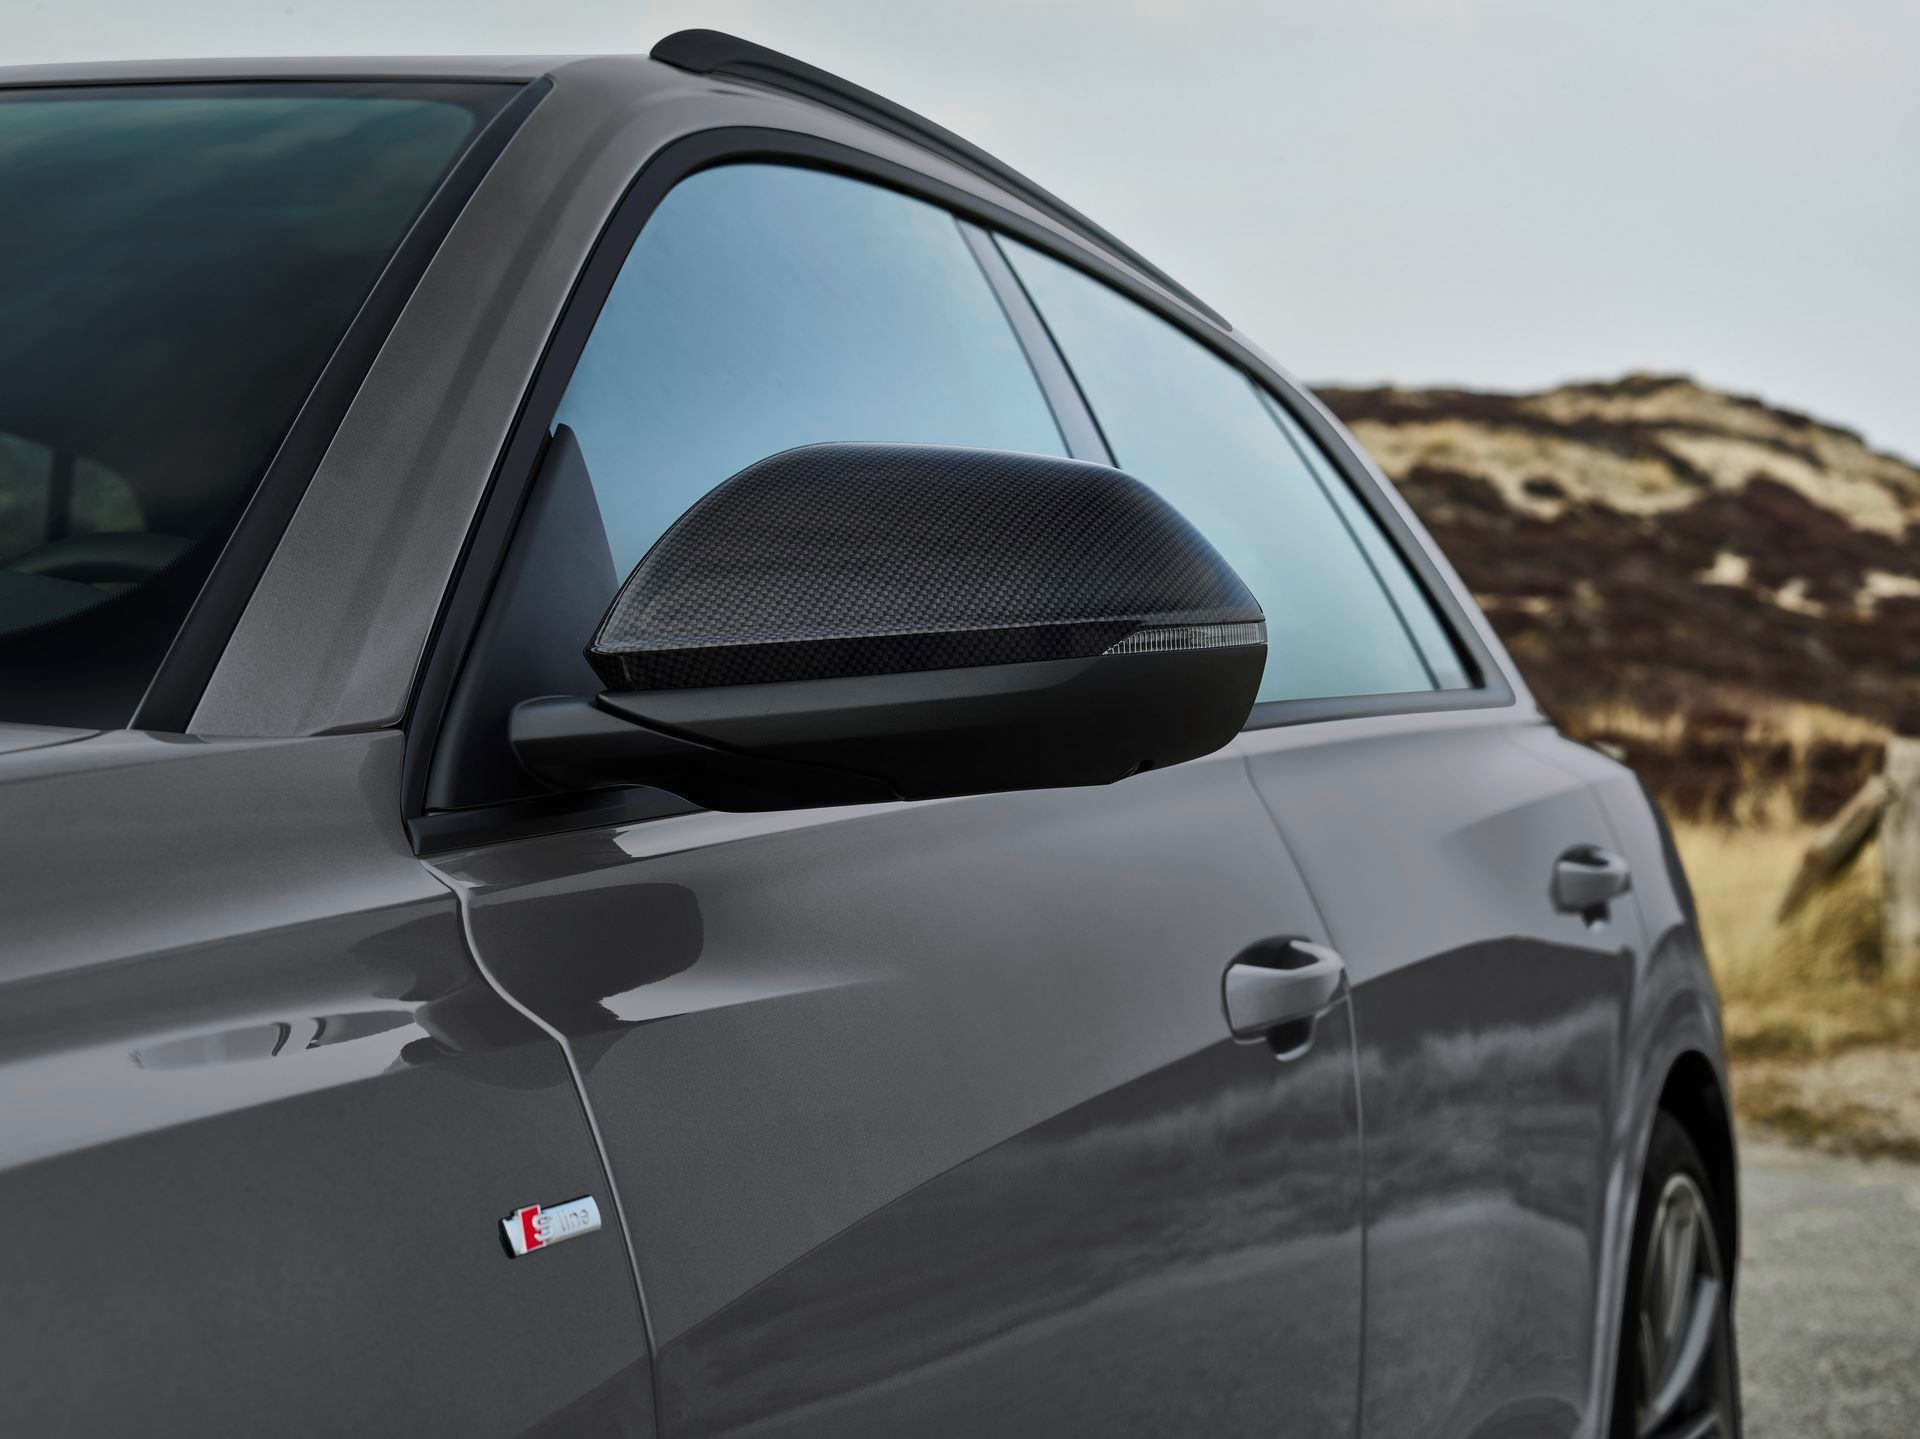 Audi-A4-A5-Q7-Q8-Competition-And-Competition-Plus-Trims-29